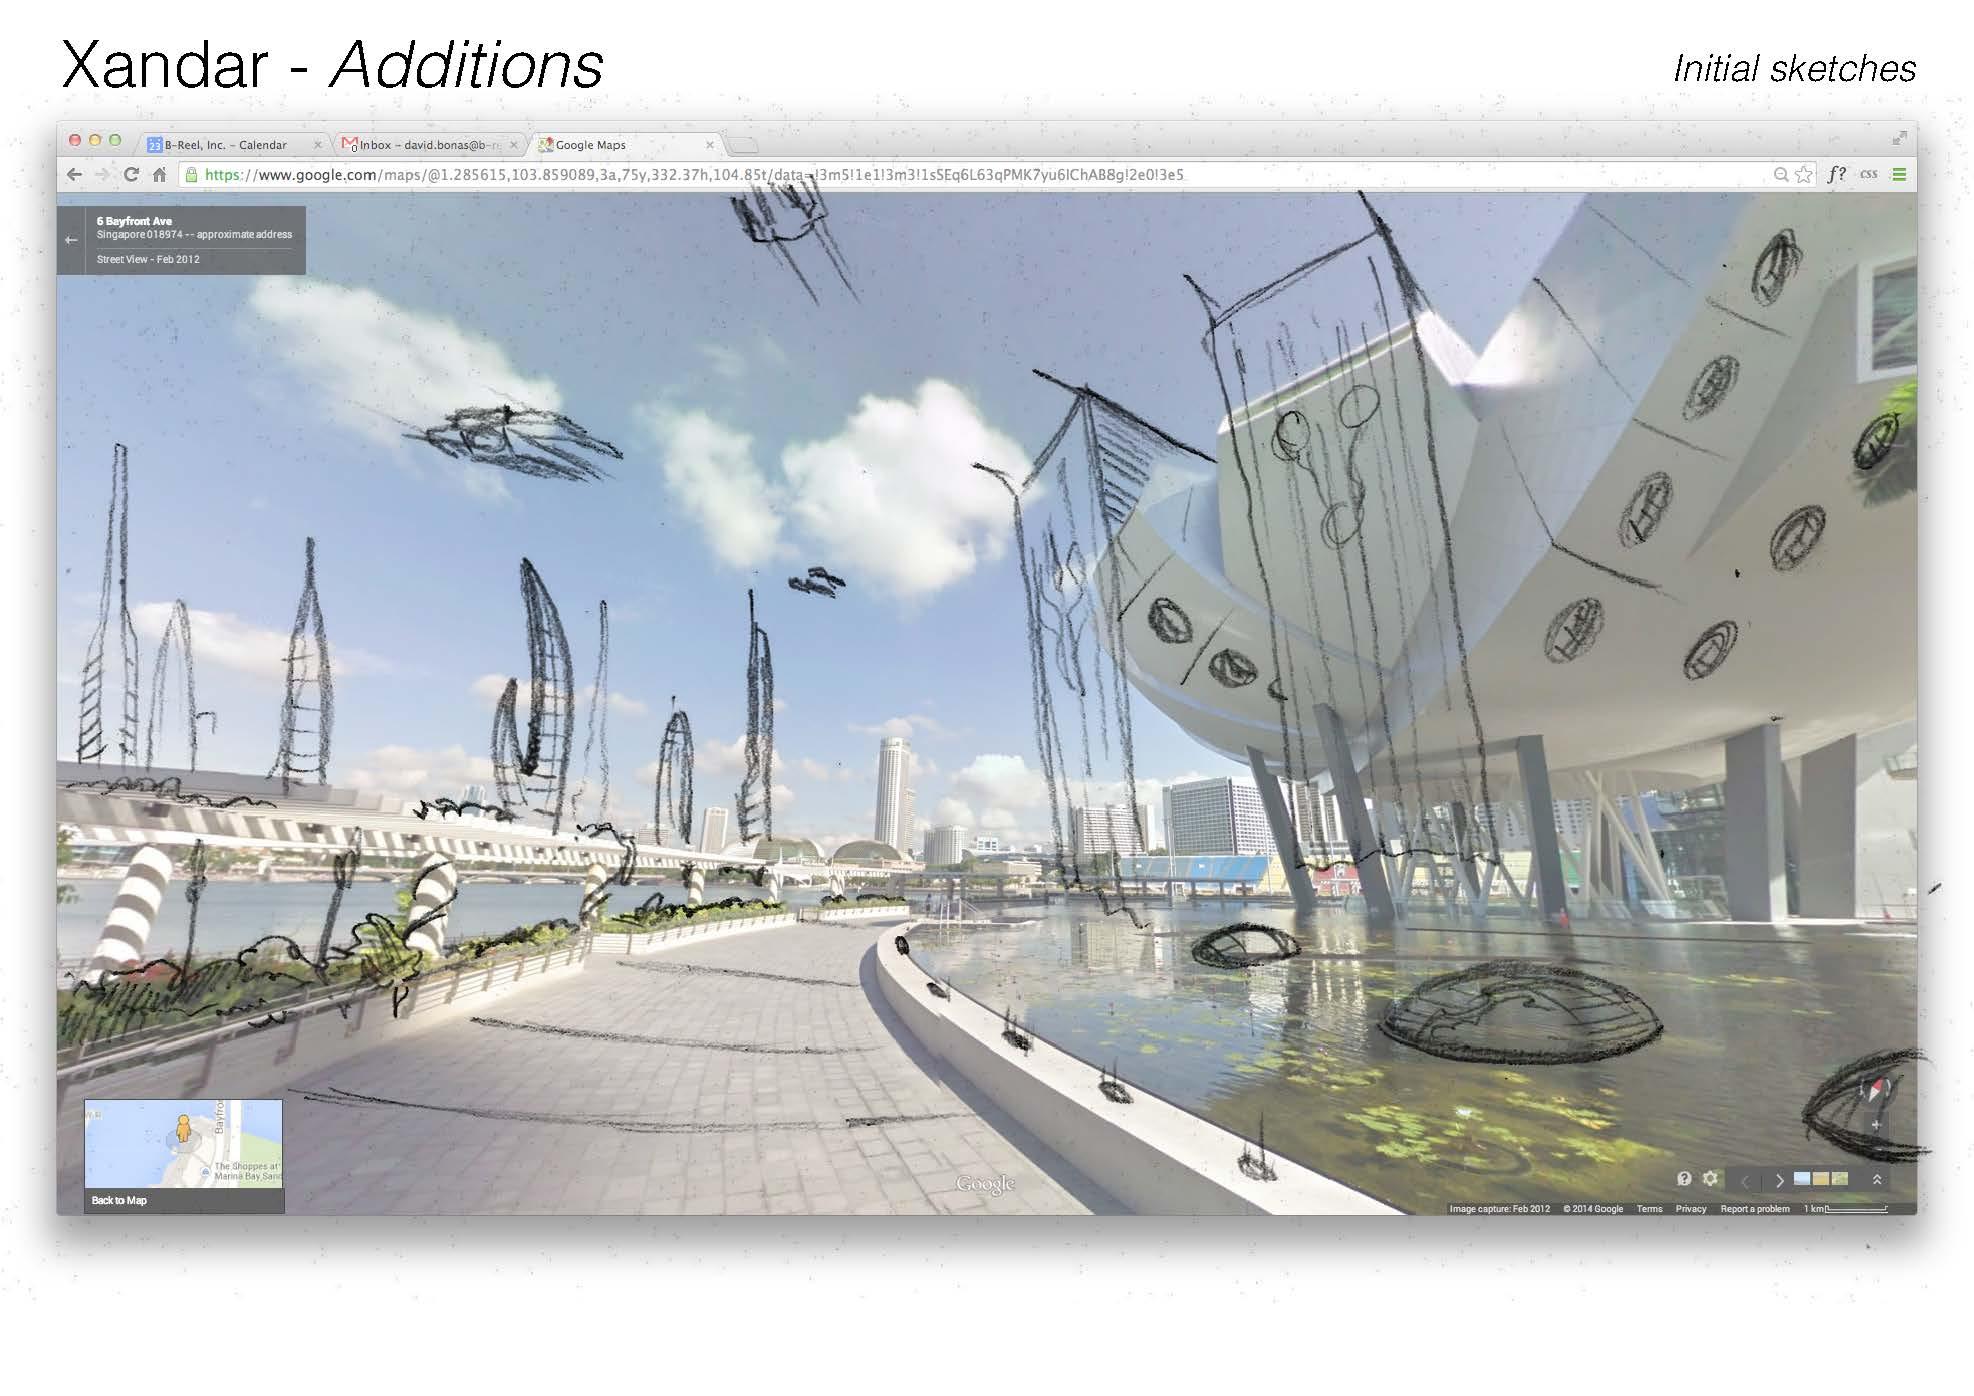 20140523_GOTG_GoogleMaps_Locations_Page_06.jpg